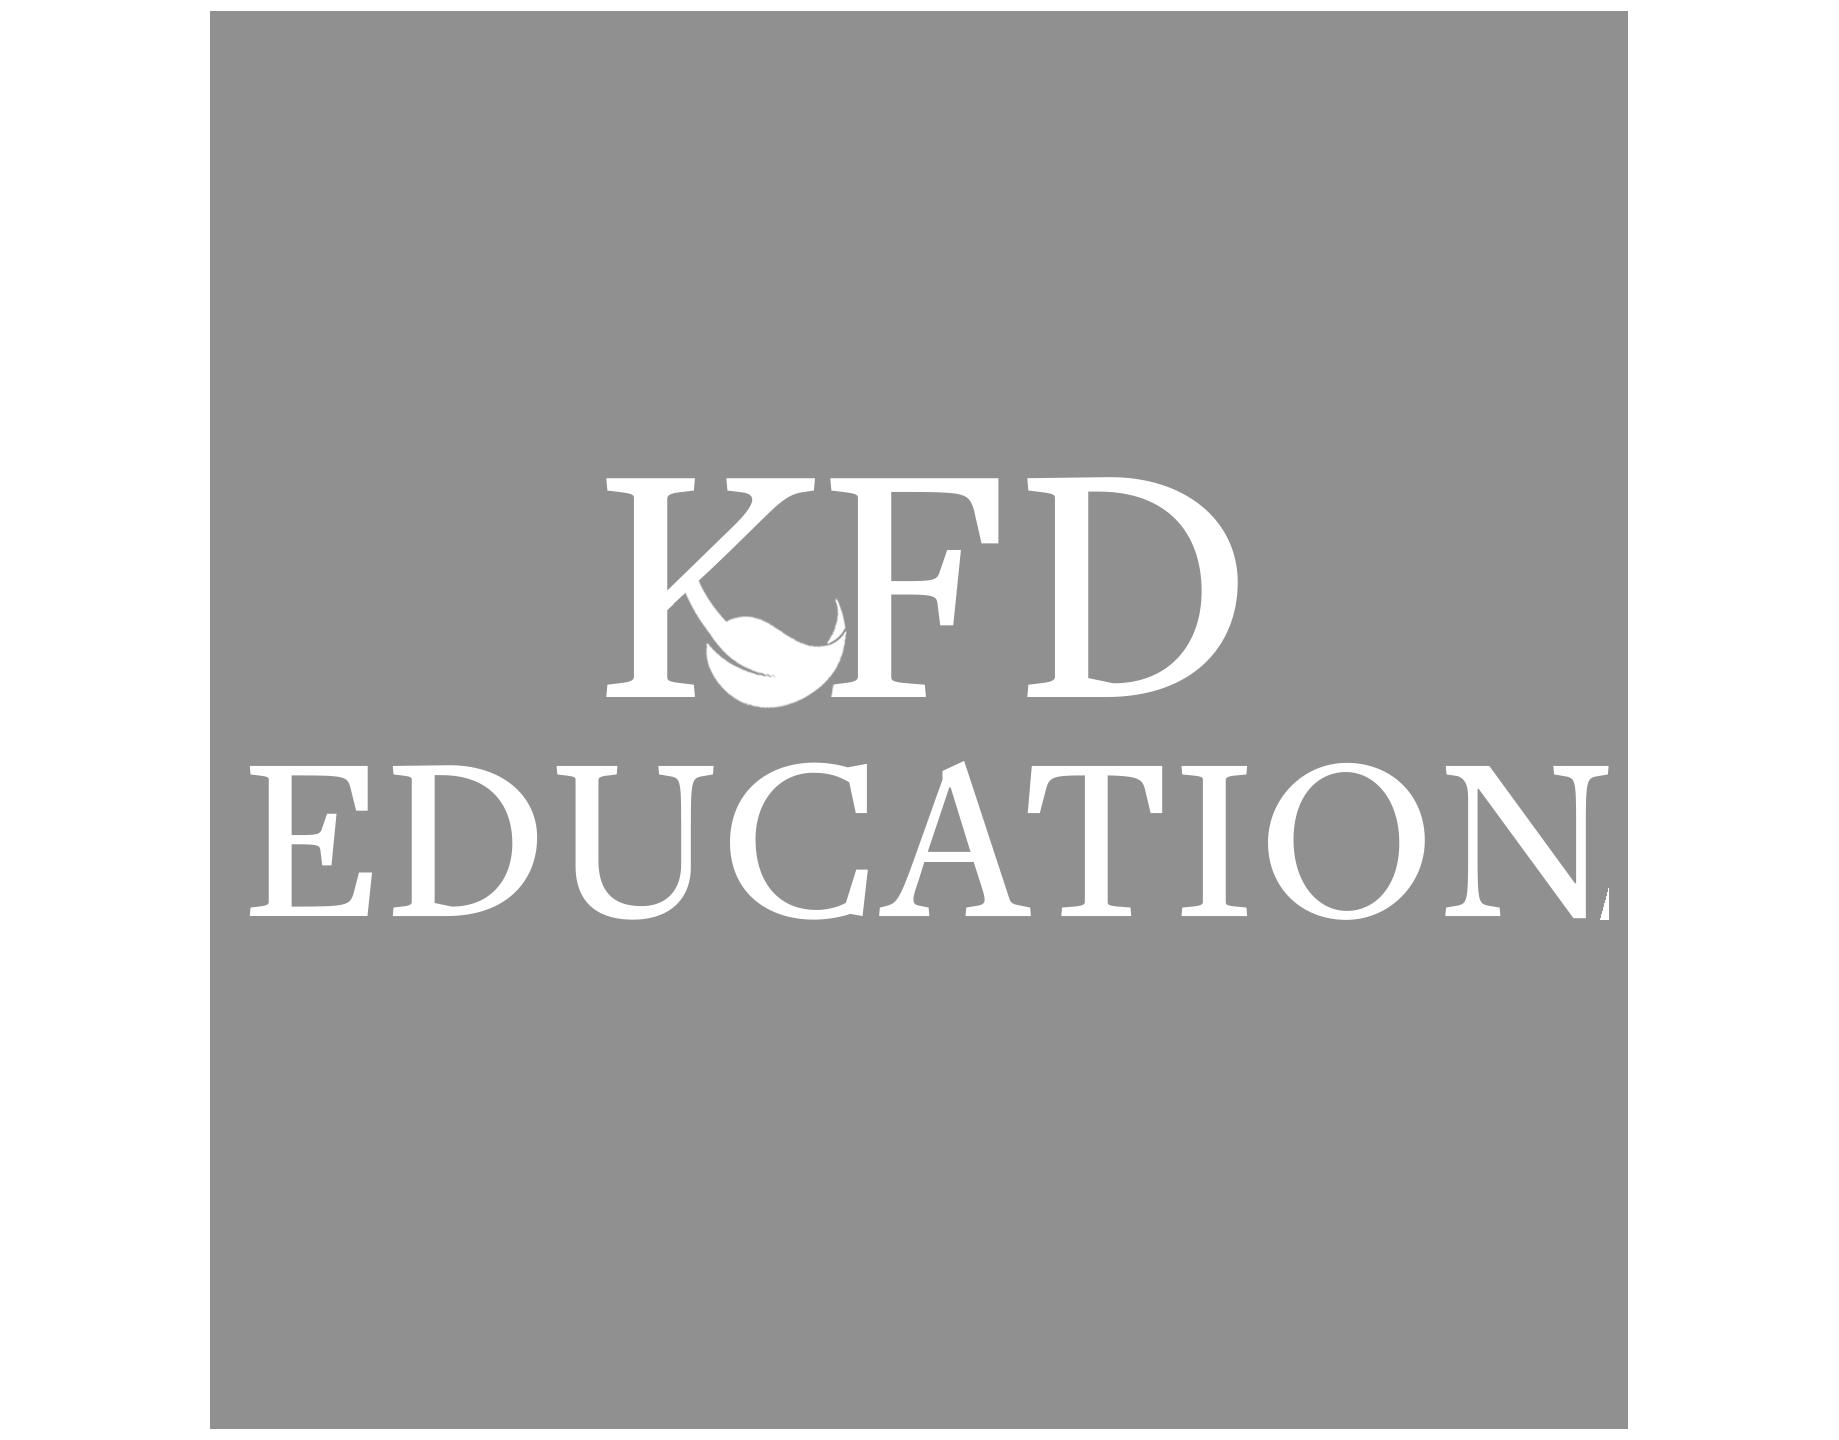 KFD Education Logo.png